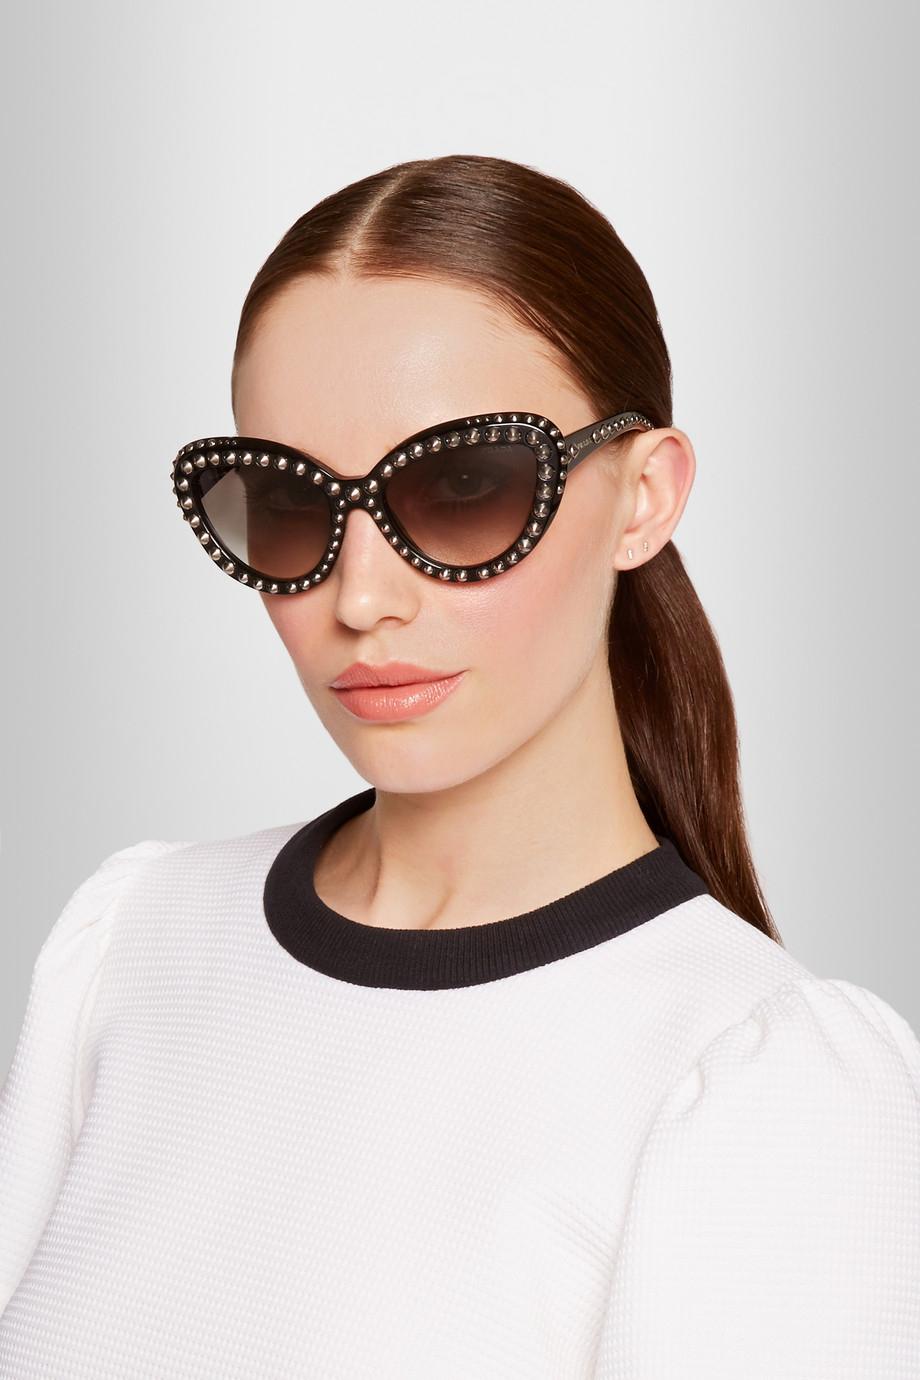 d800184ff9c Prada Cat Eye Studded Sunglasses - Bitterroot Public Library